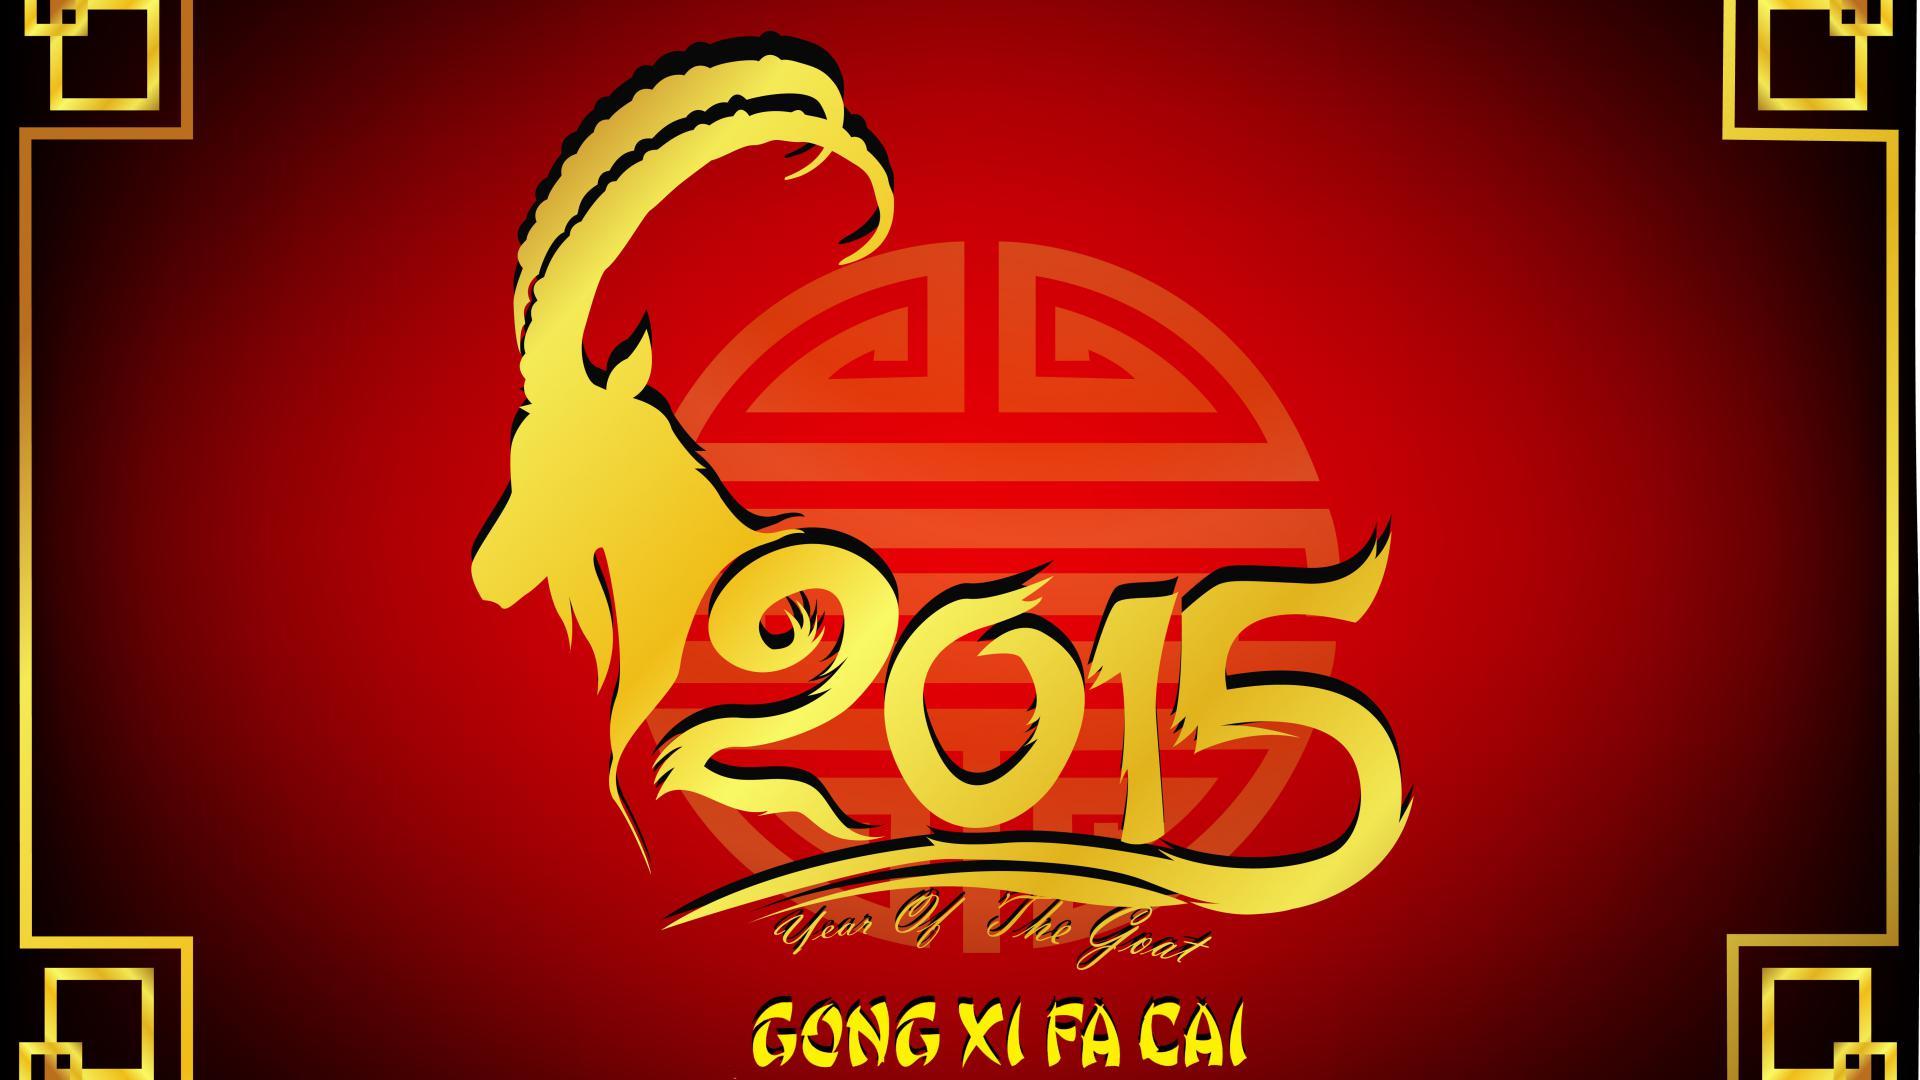 2015 Chinese New Year Wallpaper Wallpaper WallpaperLepi 1920x1080